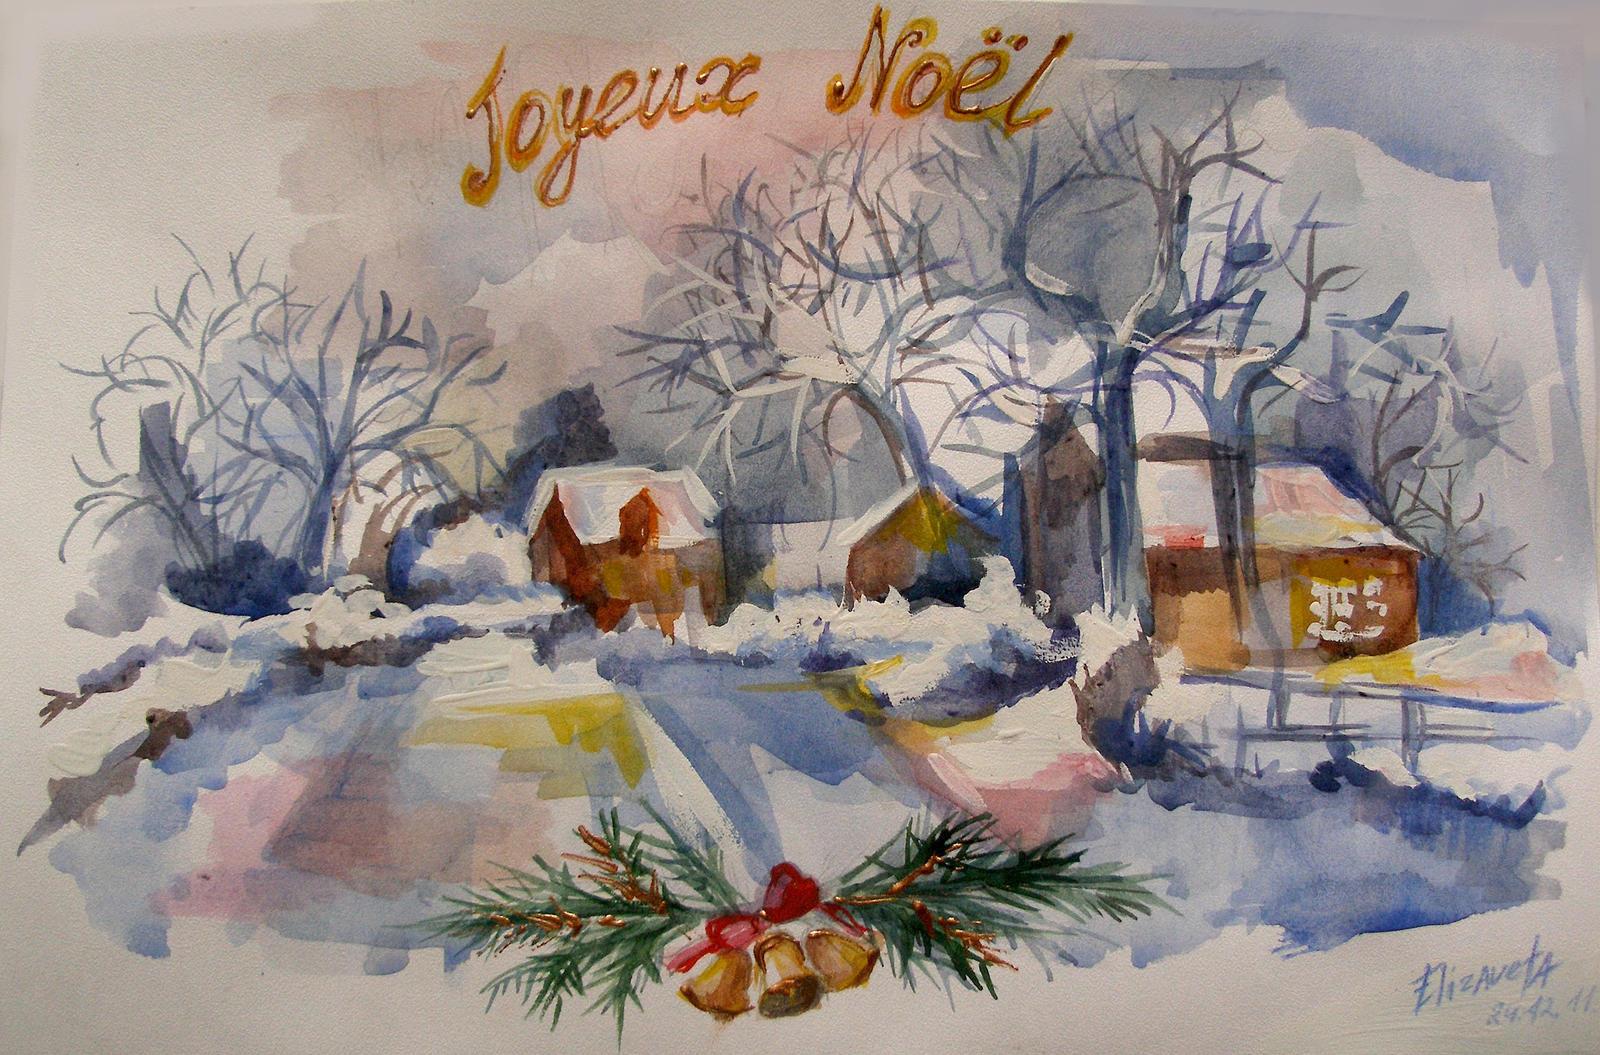 Joyeux Noel by KapustinaElizaveta